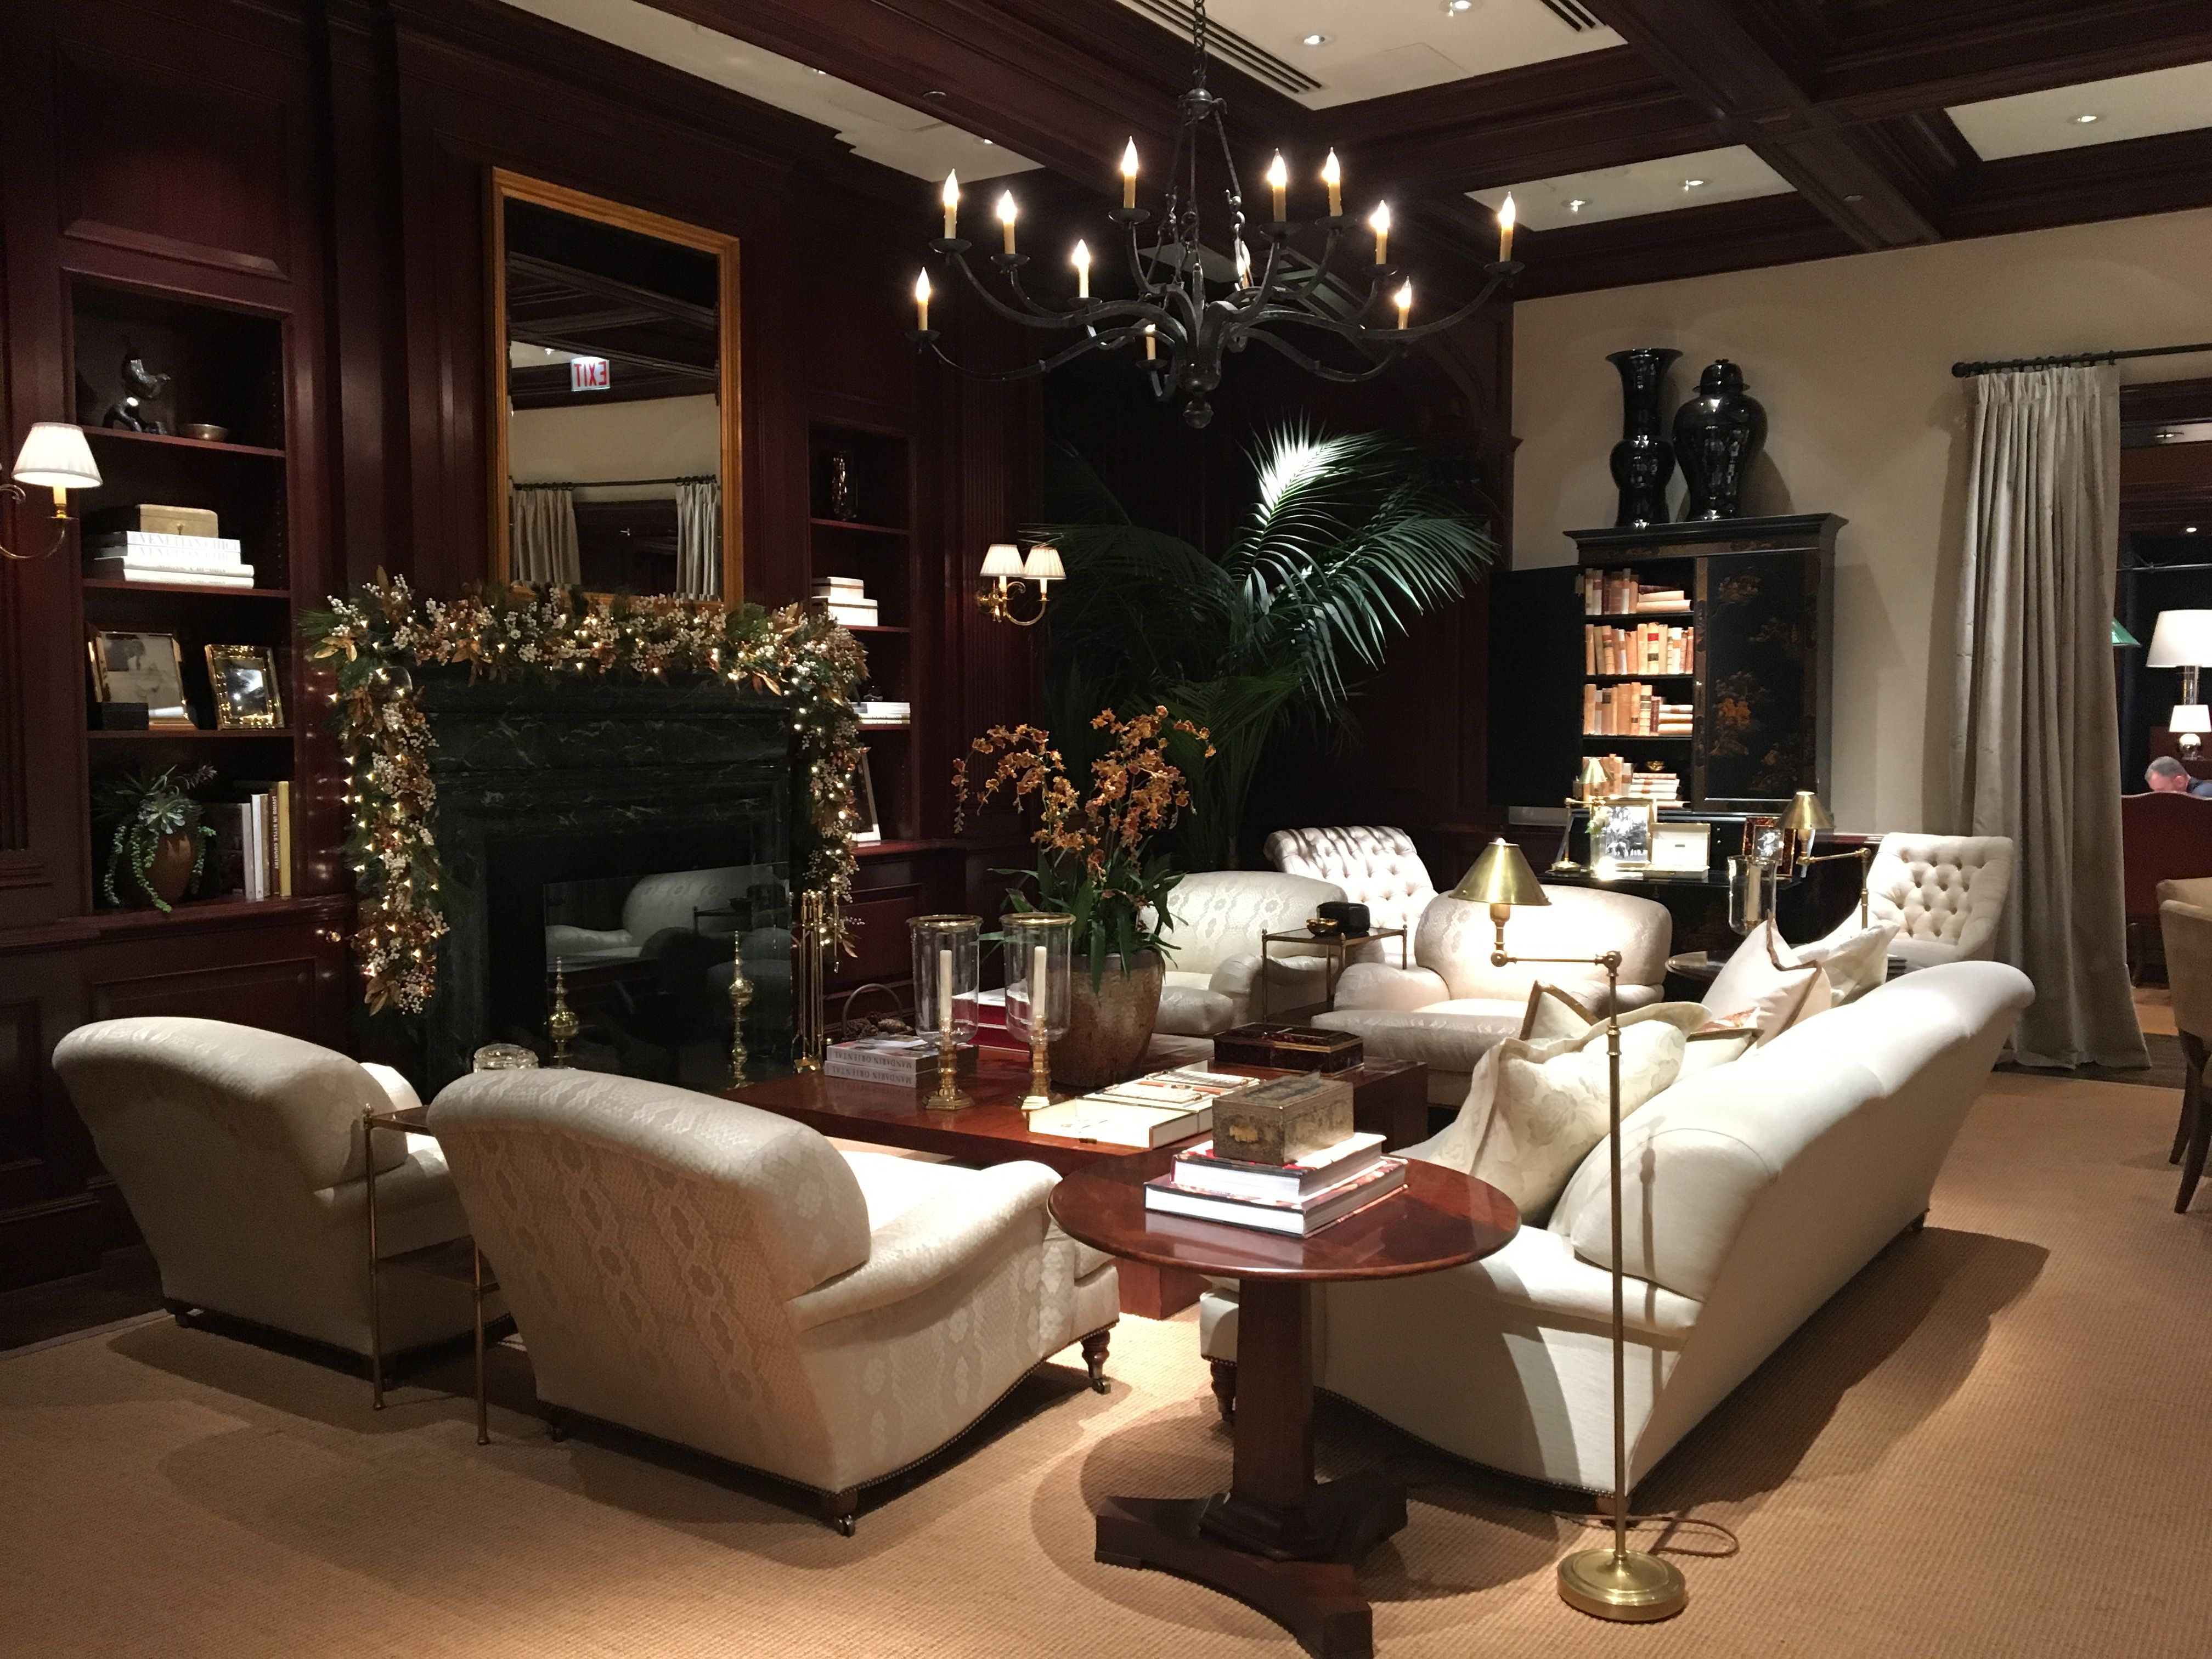 Ralph Lauren Michigan Avenue Chicago For The Home Pinterest  # Muebles Ralph Lauren Espana